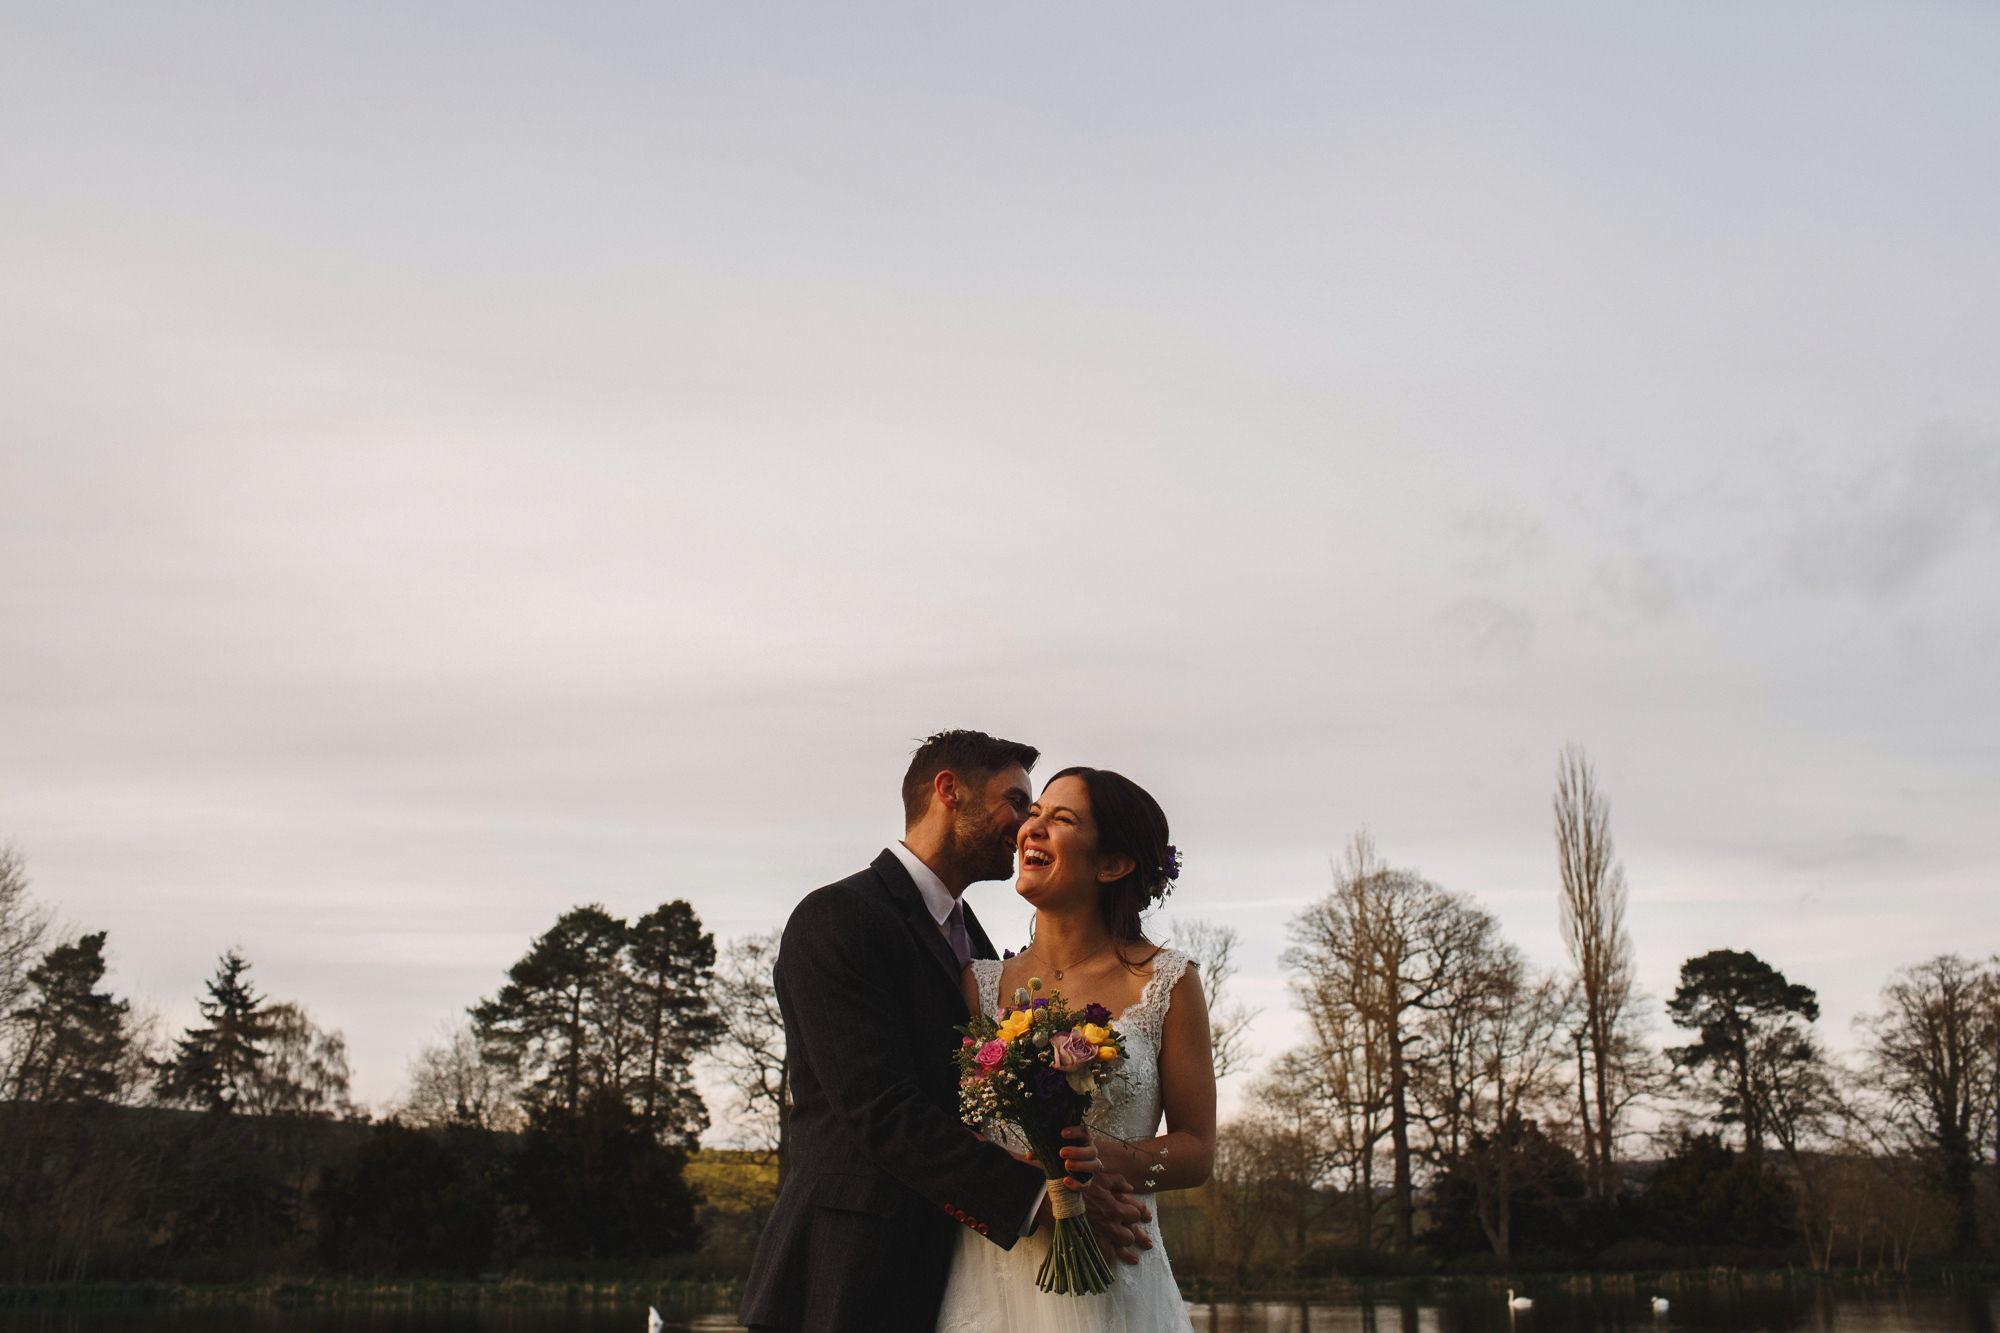 Walcot hall wedding photography shropshire 40